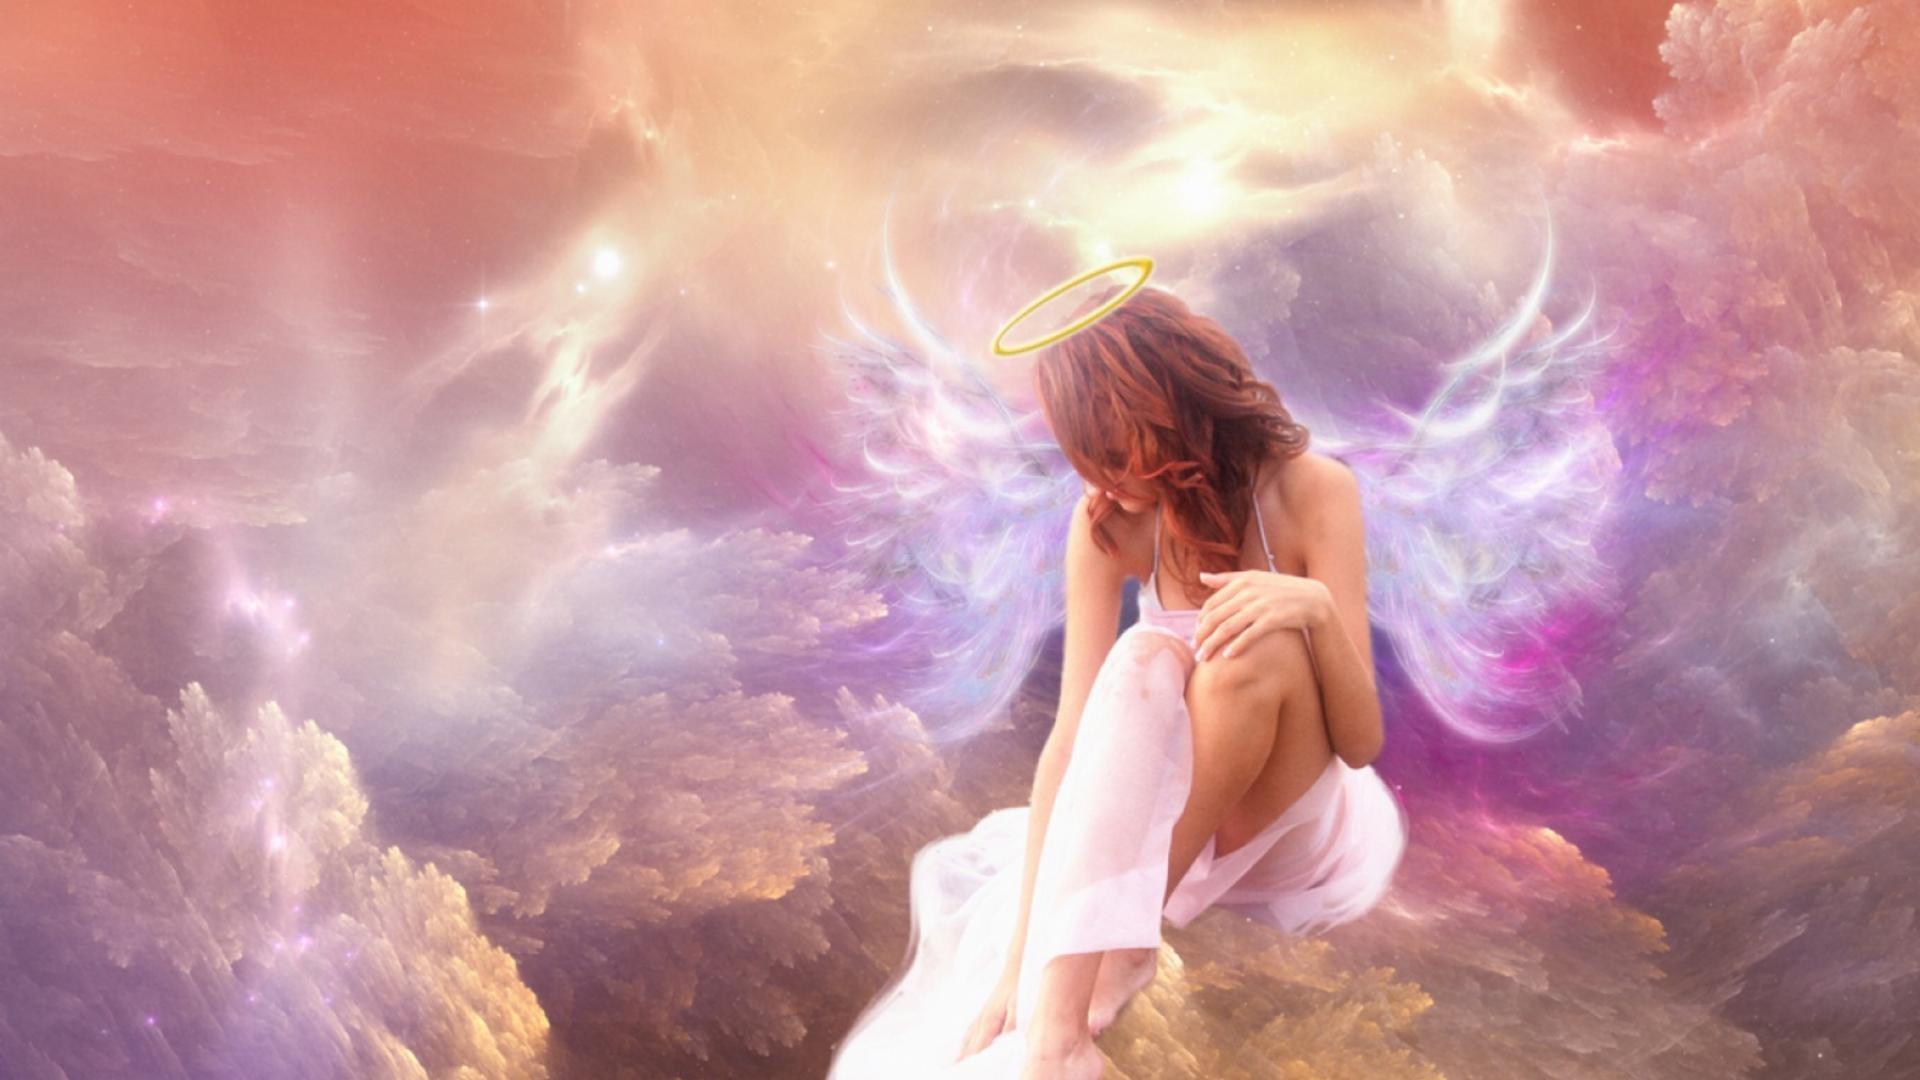 Fantasy Angel Wallpaper 1920×1080 #122257 HD Wallpaper Res: .